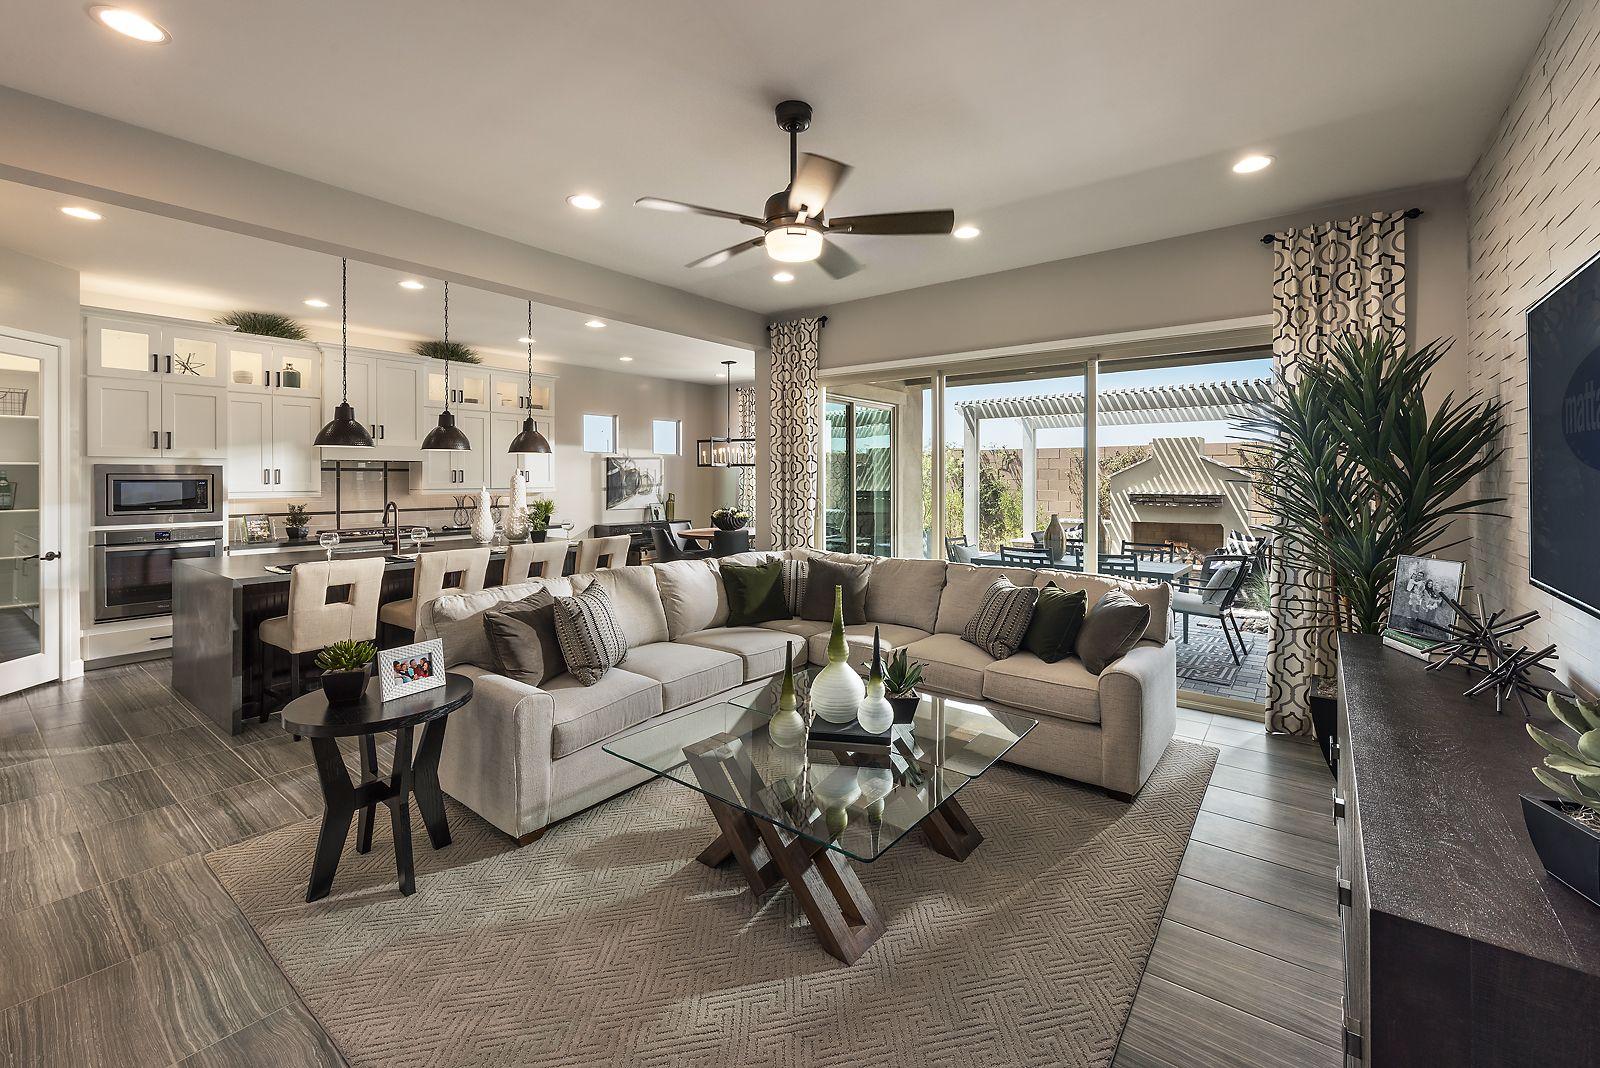 Bellwood Home, New home designs, Farmhouse decor